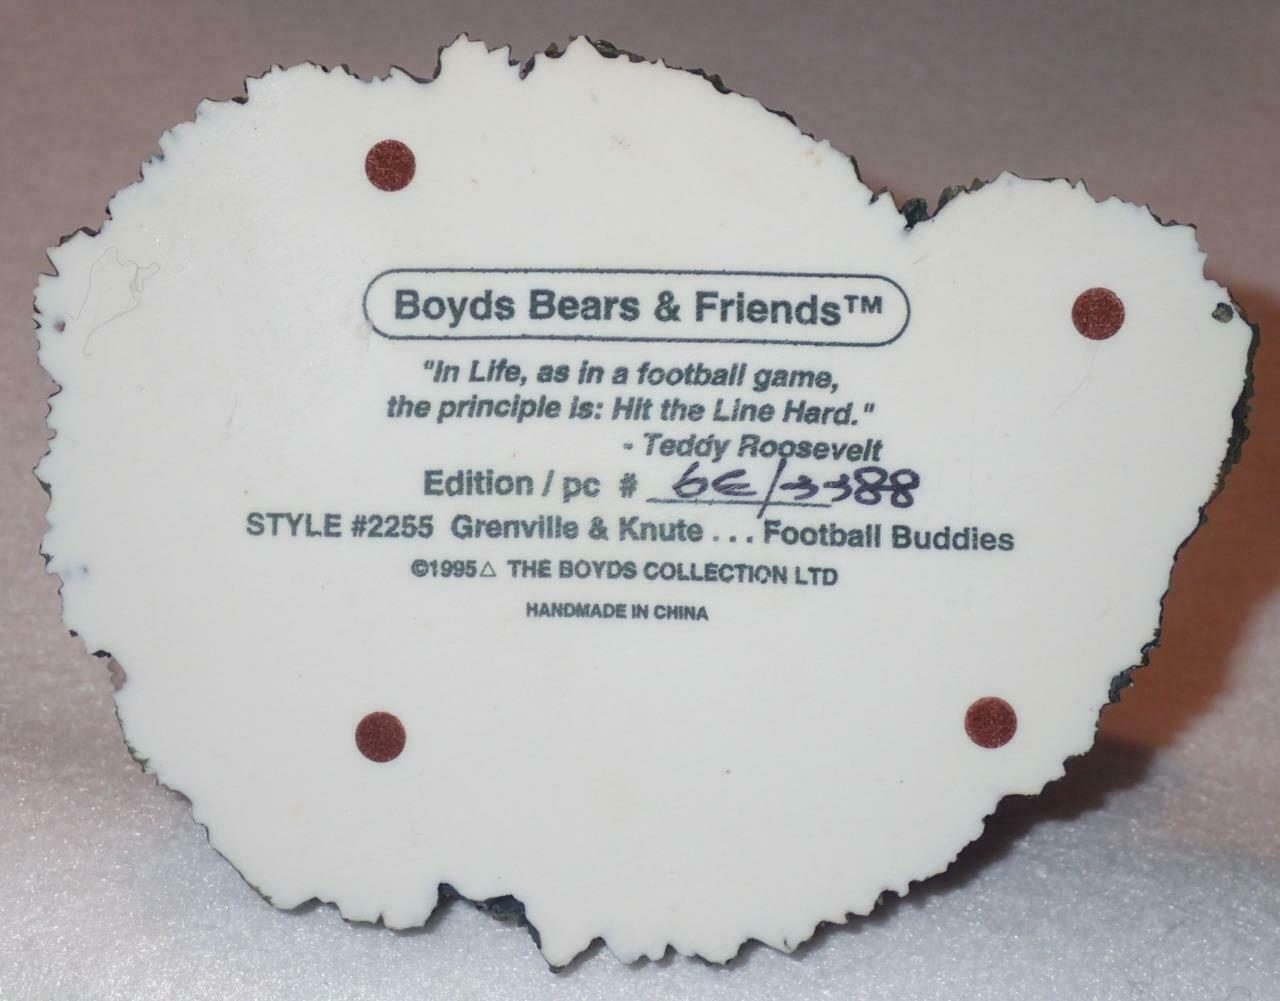 Boyd Bearstone Resin Bears Grenville & Knute Football Buddies Figurine #2255 image 4